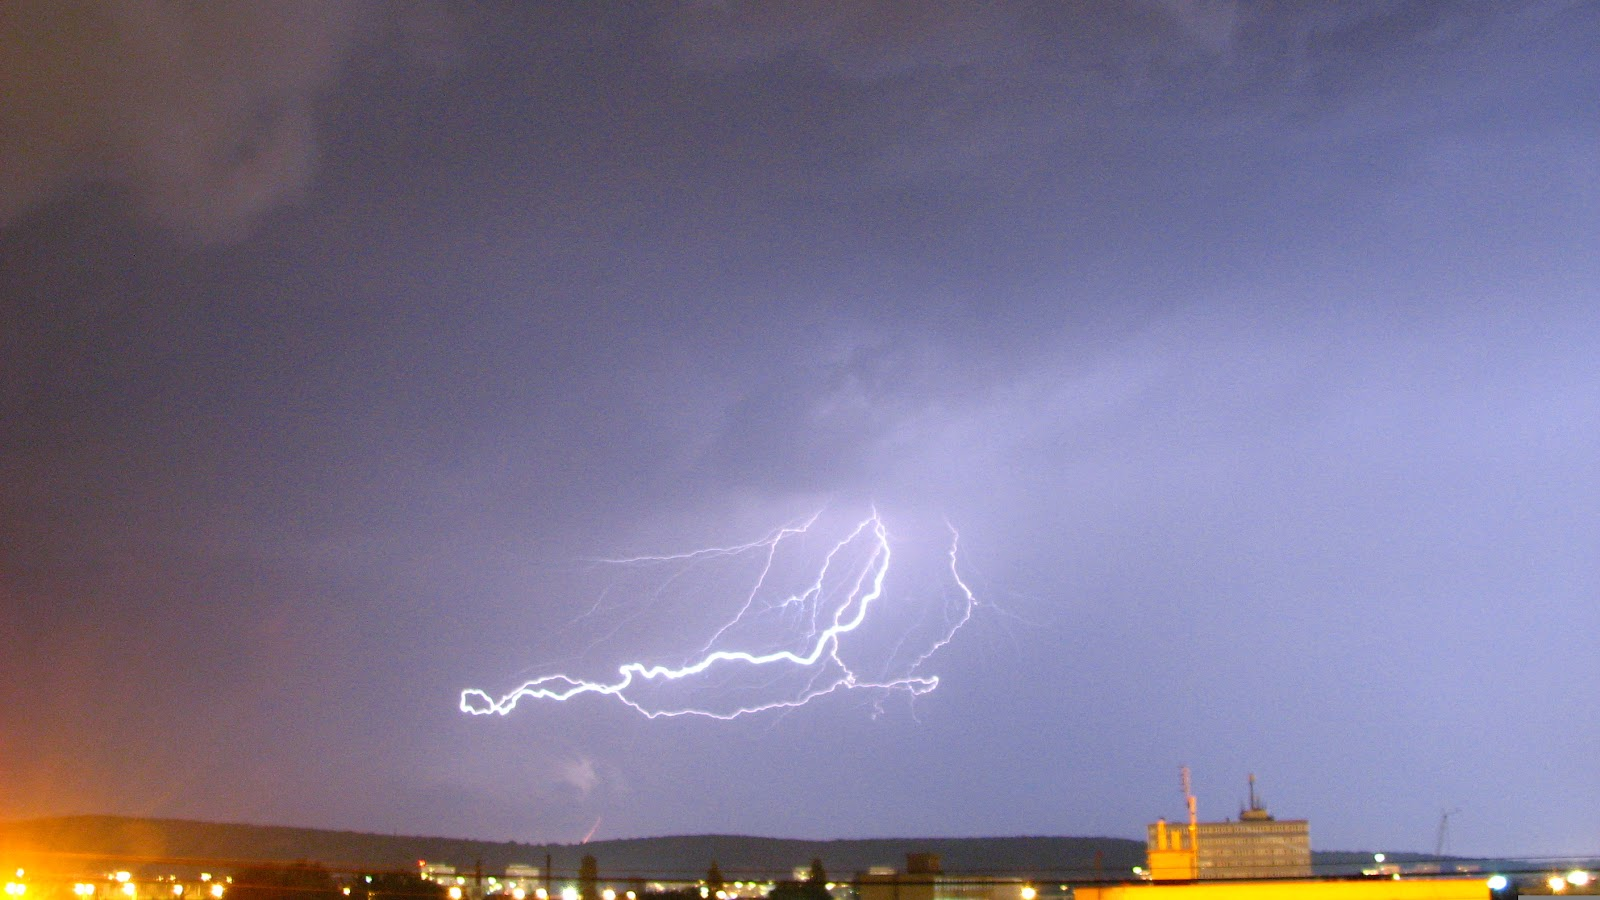 http://1.bp.blogspot.com/-JQUQO24EpGg/T1bP-AhhJjI/AAAAAAAAIwo/QR90HoTTj1w/s1600/lightning+thunderstorm.jpg